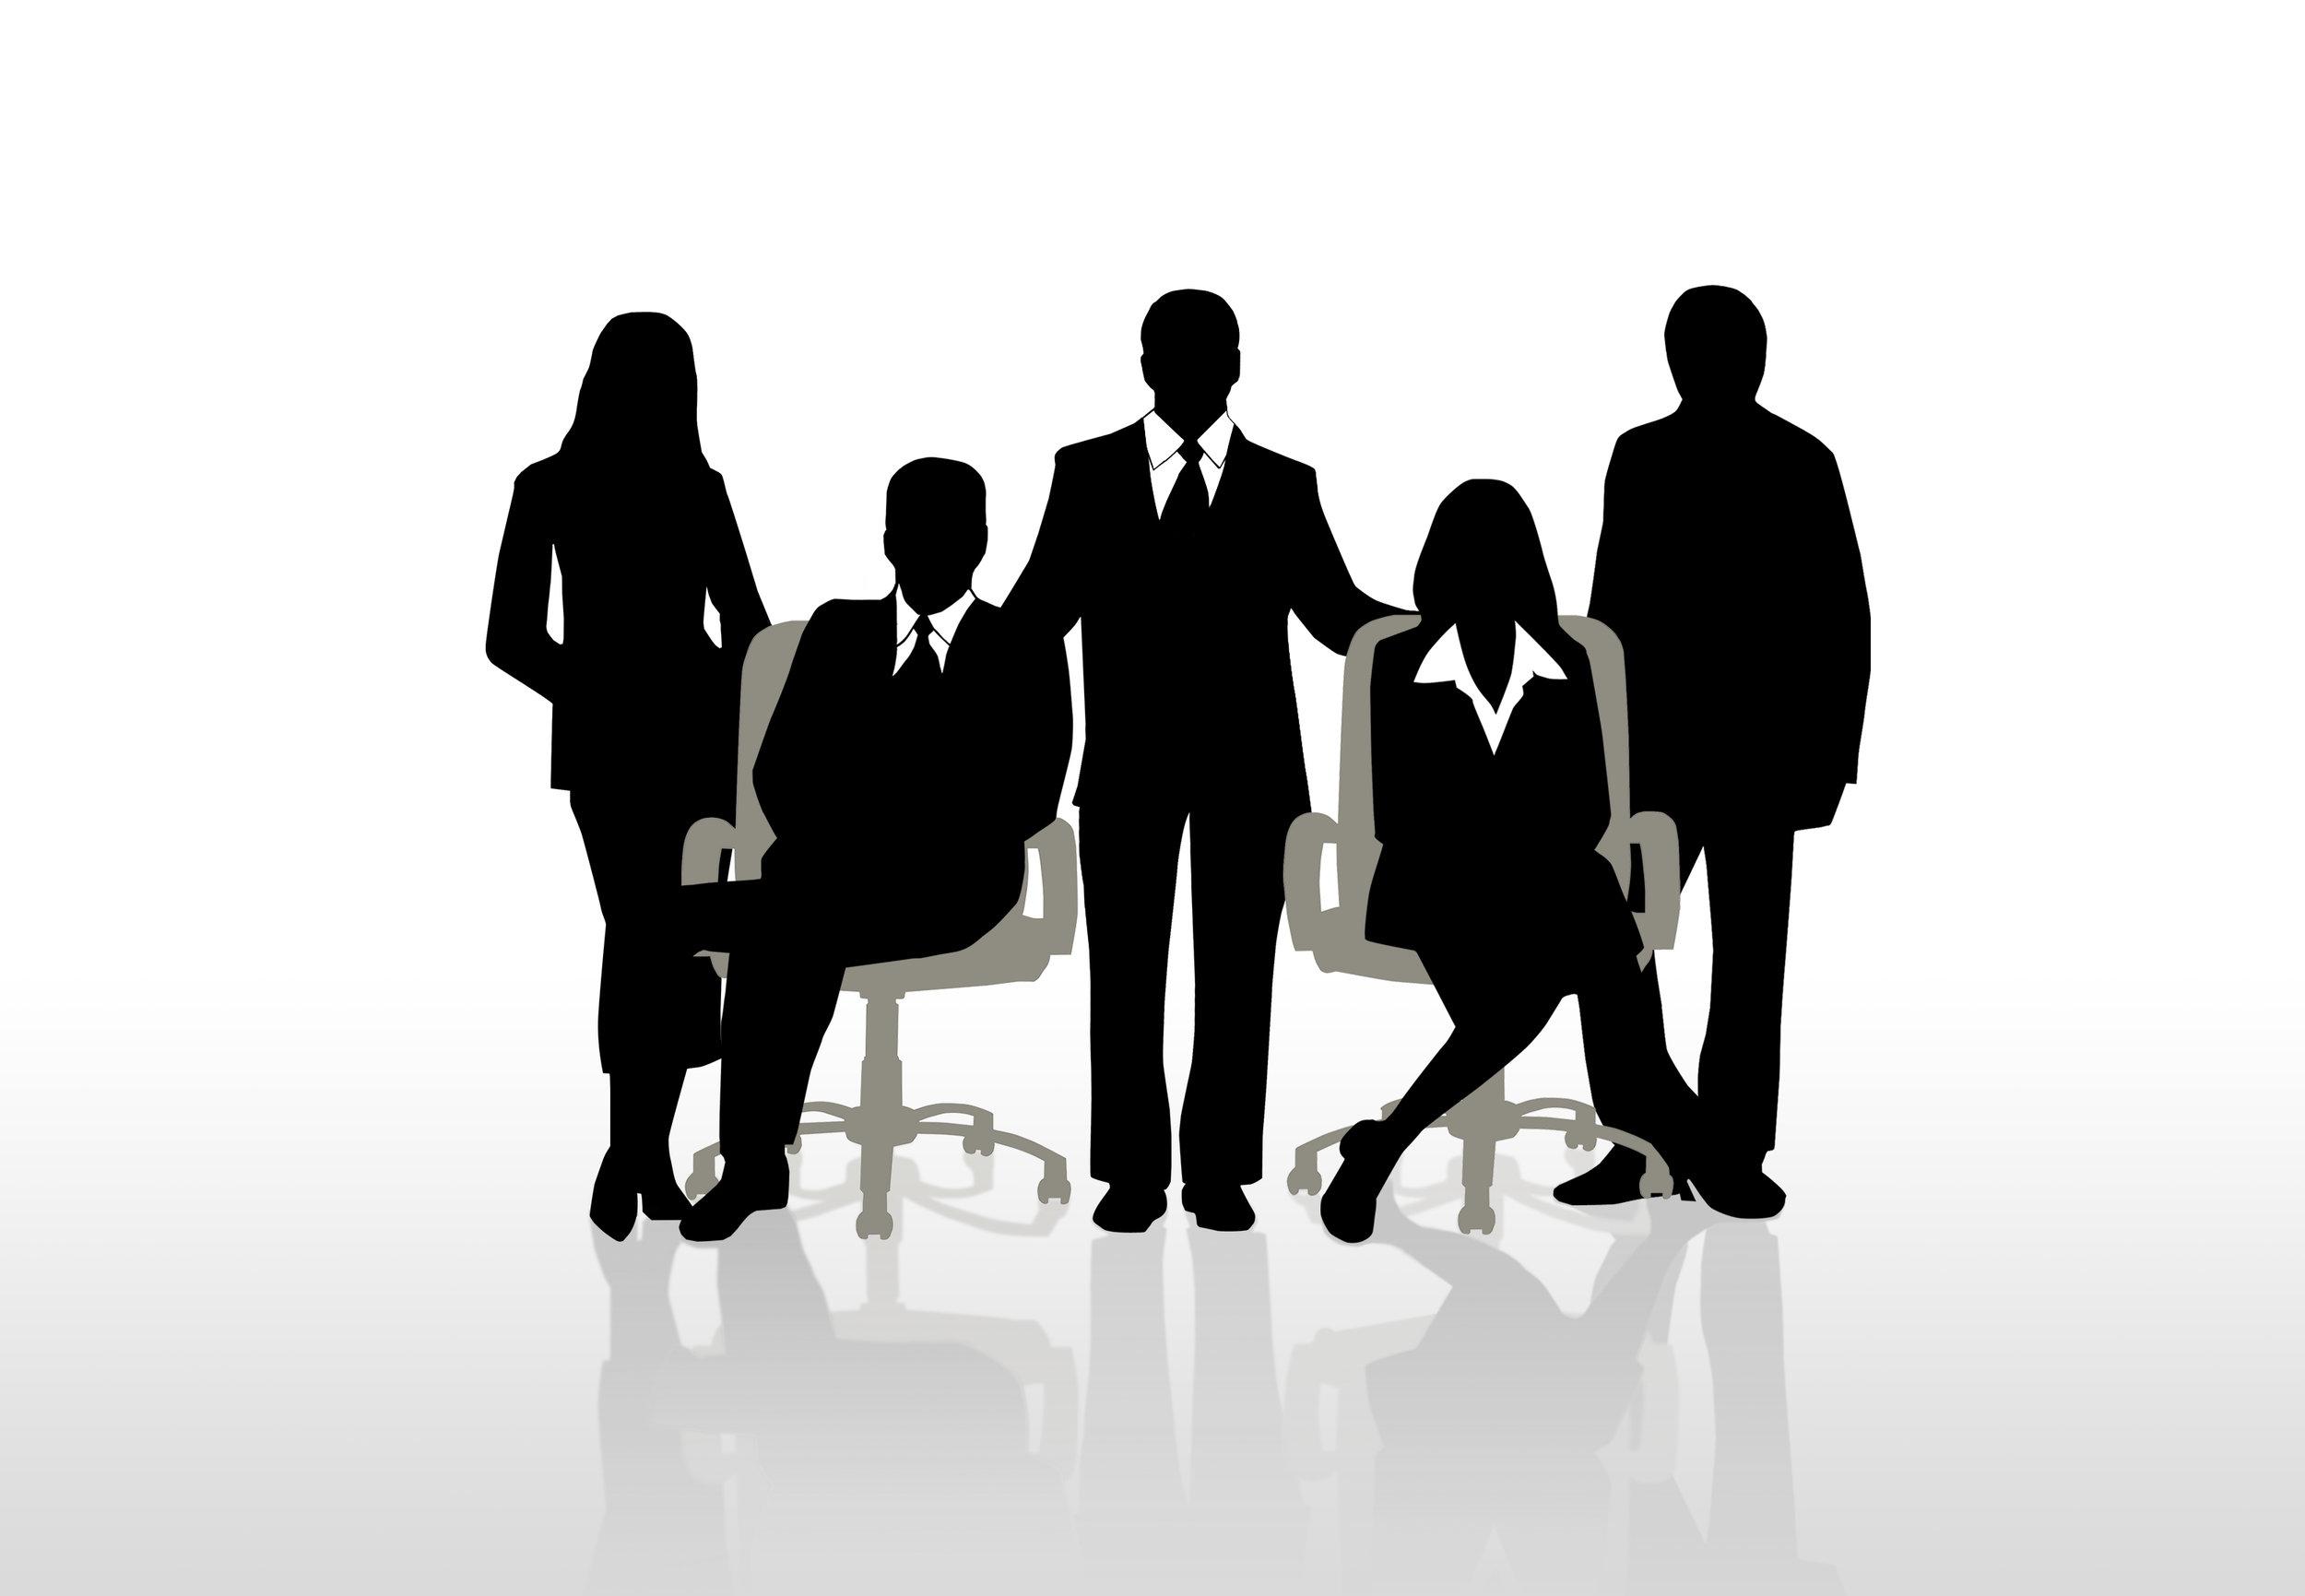 board-of-trustees-clipart-1.jpg